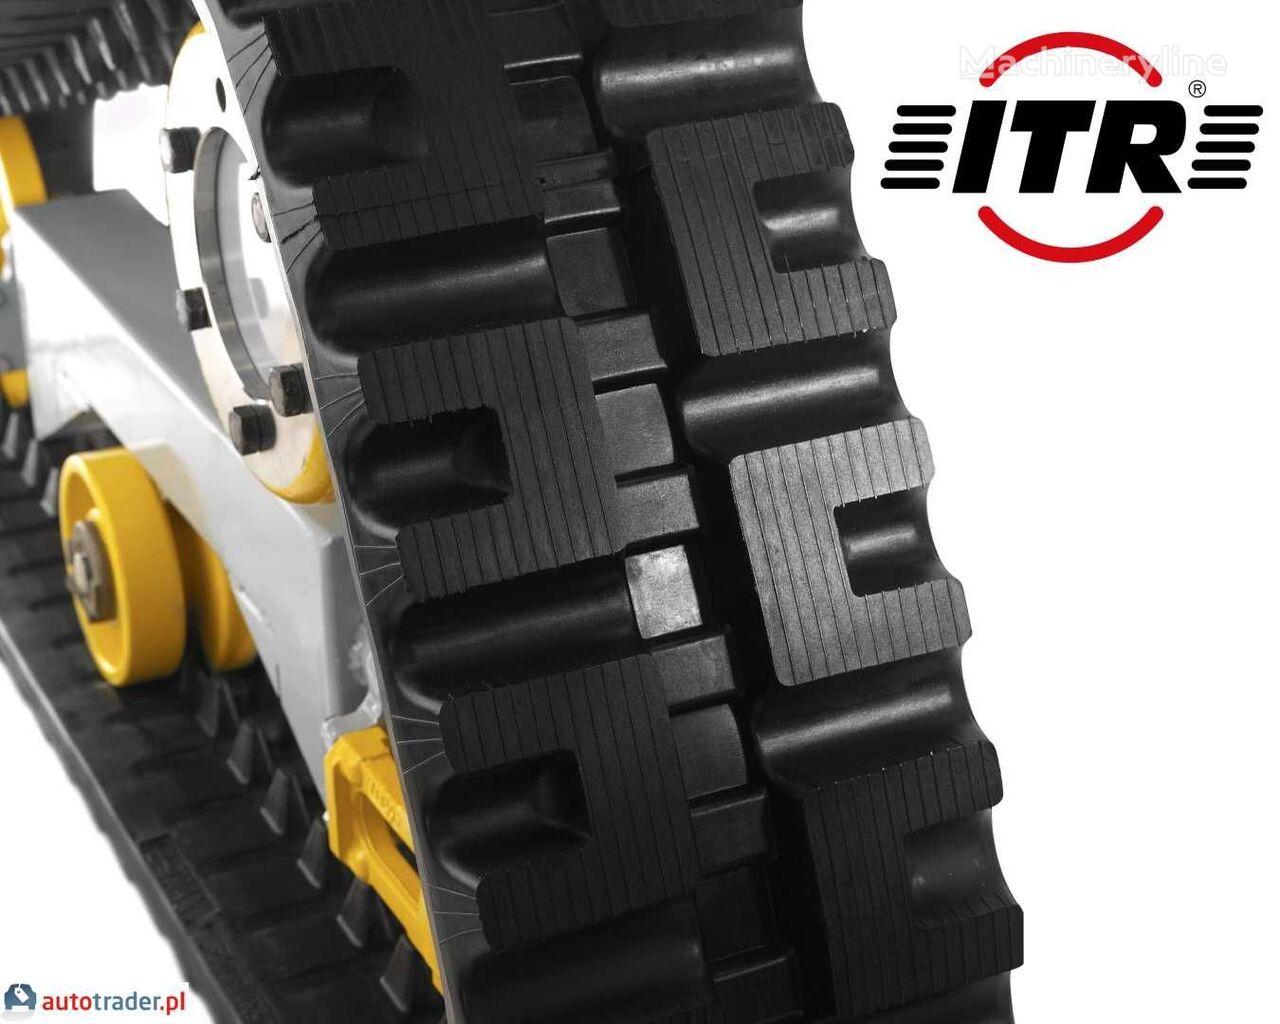 lagartas para ITR PEL JOB LS406 2016r ITR mini-escavadora